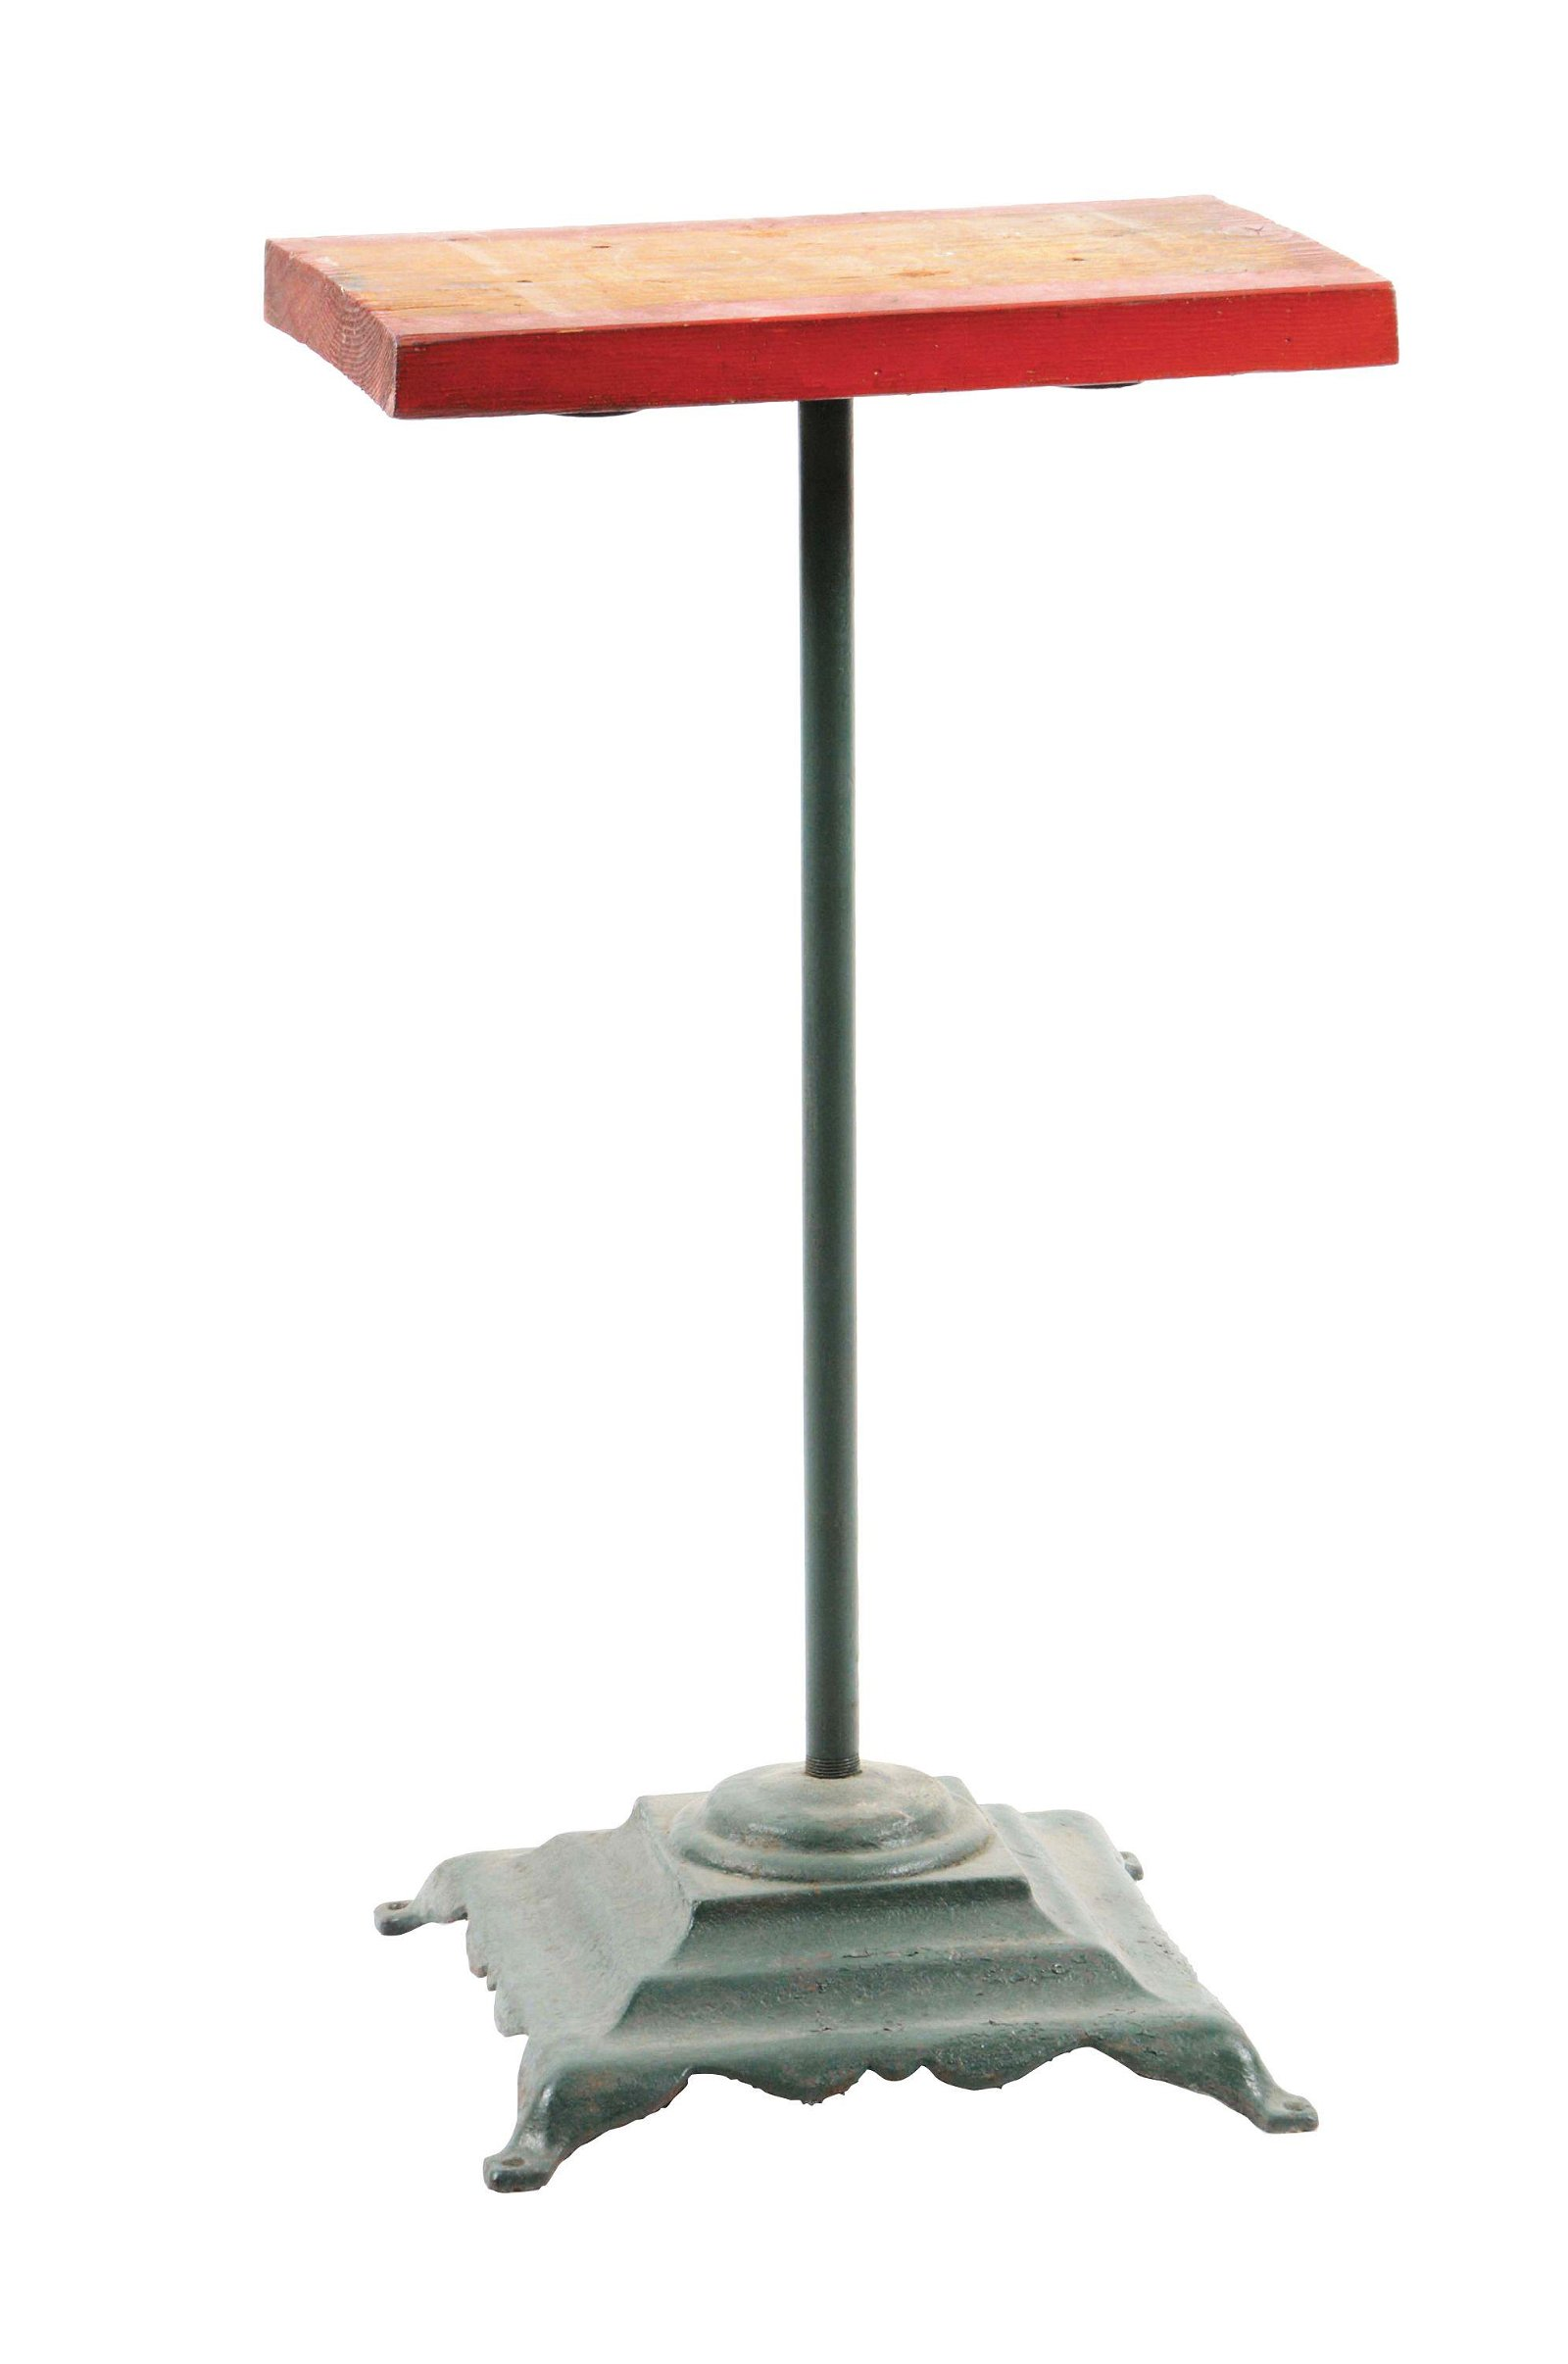 CAST-IRON COLUMBUS VENDING MACHINE STAND IN GREEN